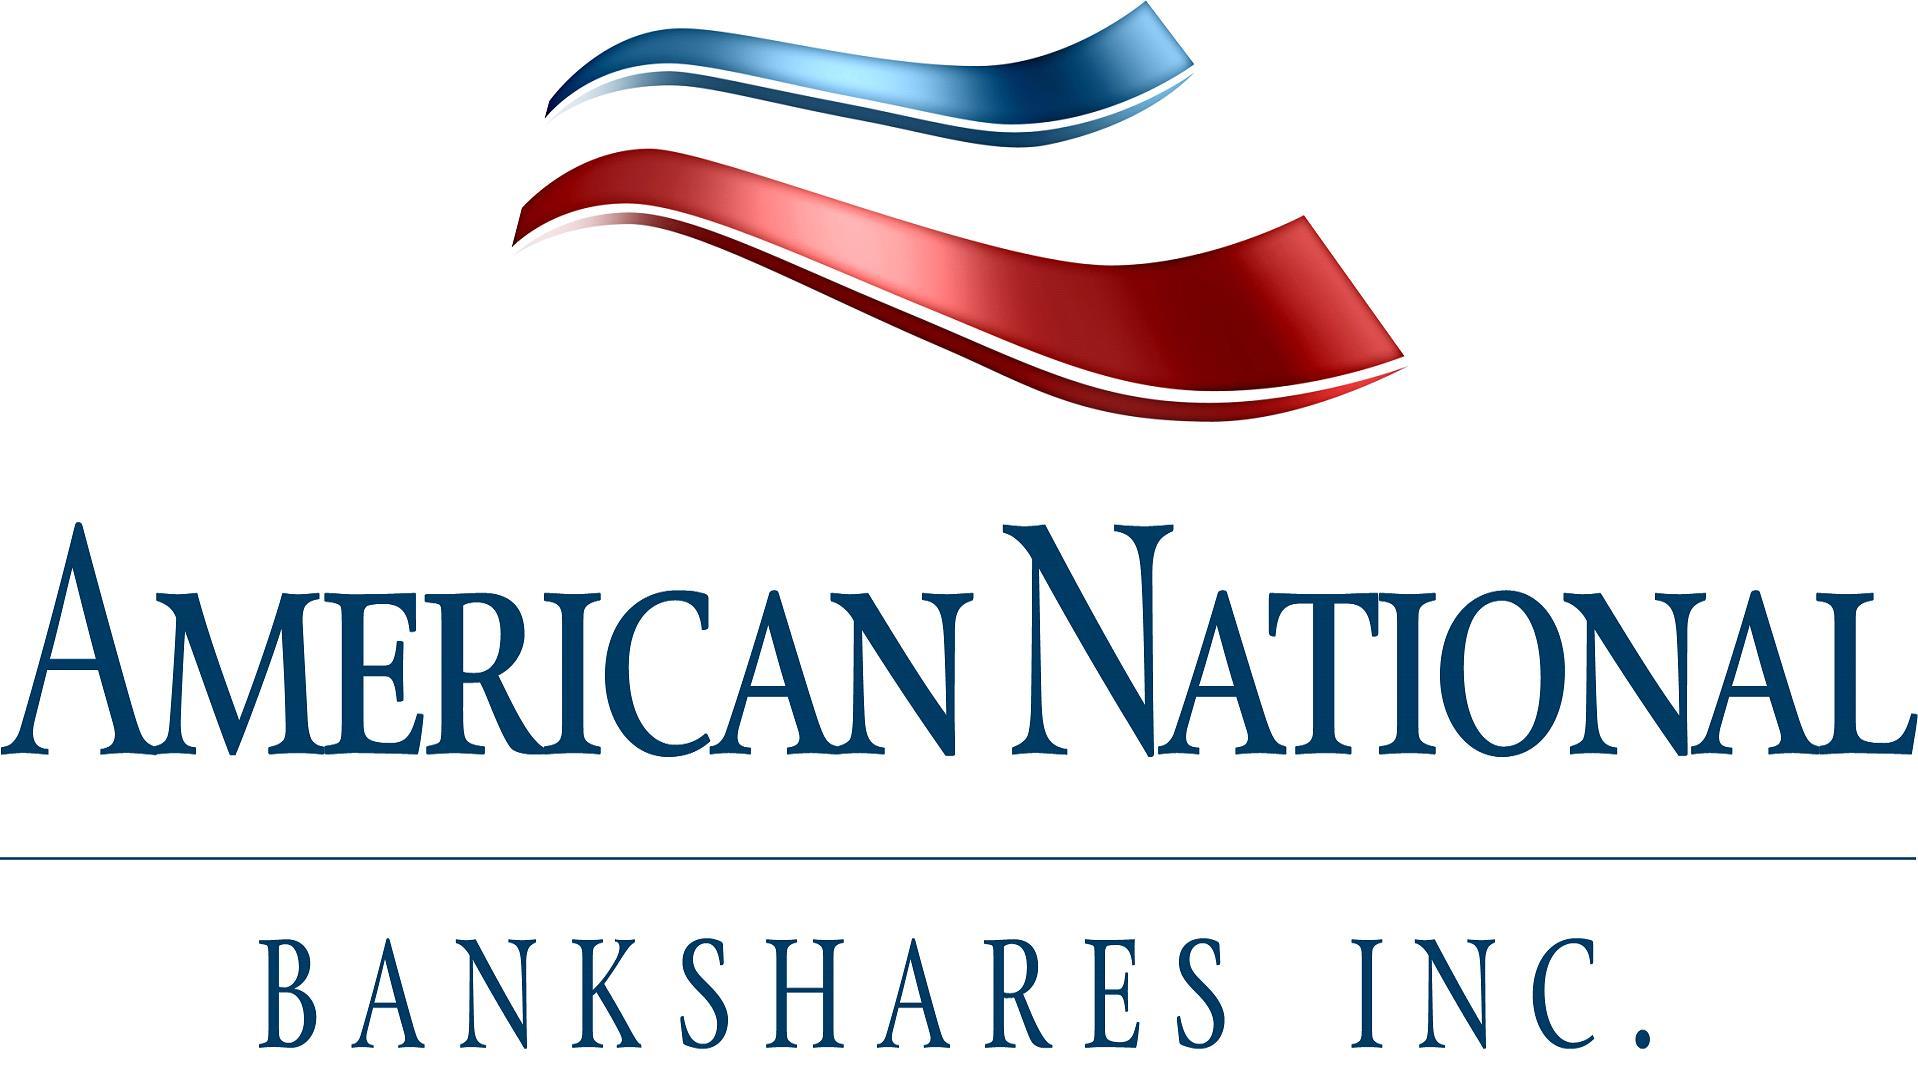 American National Bankshares Inc